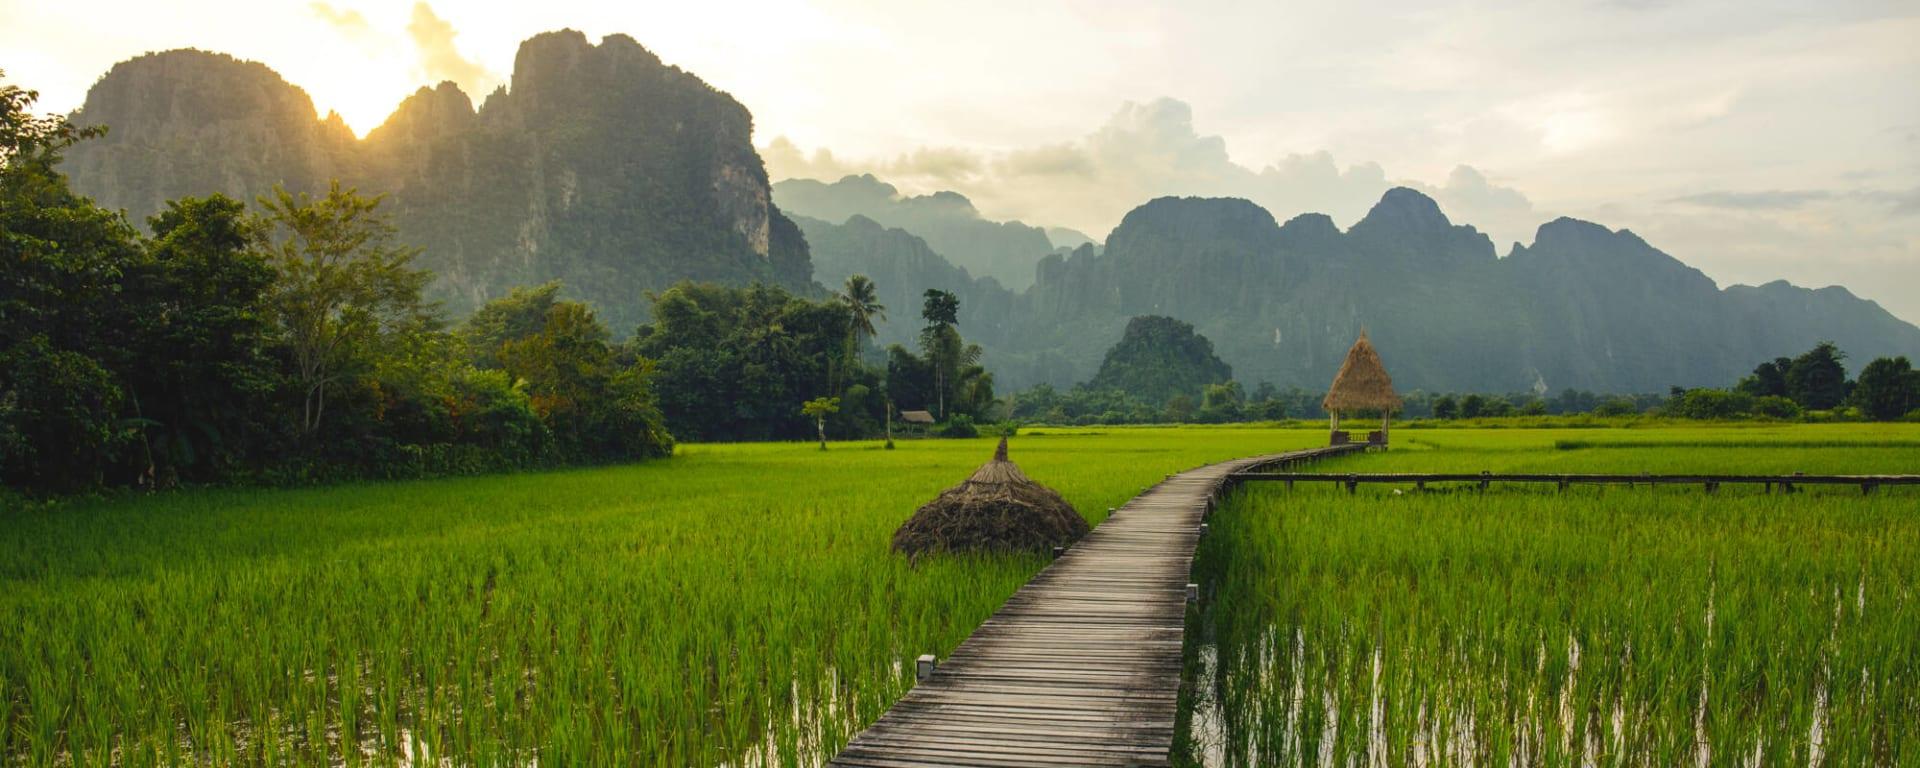 Überland von Luang Prabang nach Vientiane: Laos Vang Vieng Reisfeld